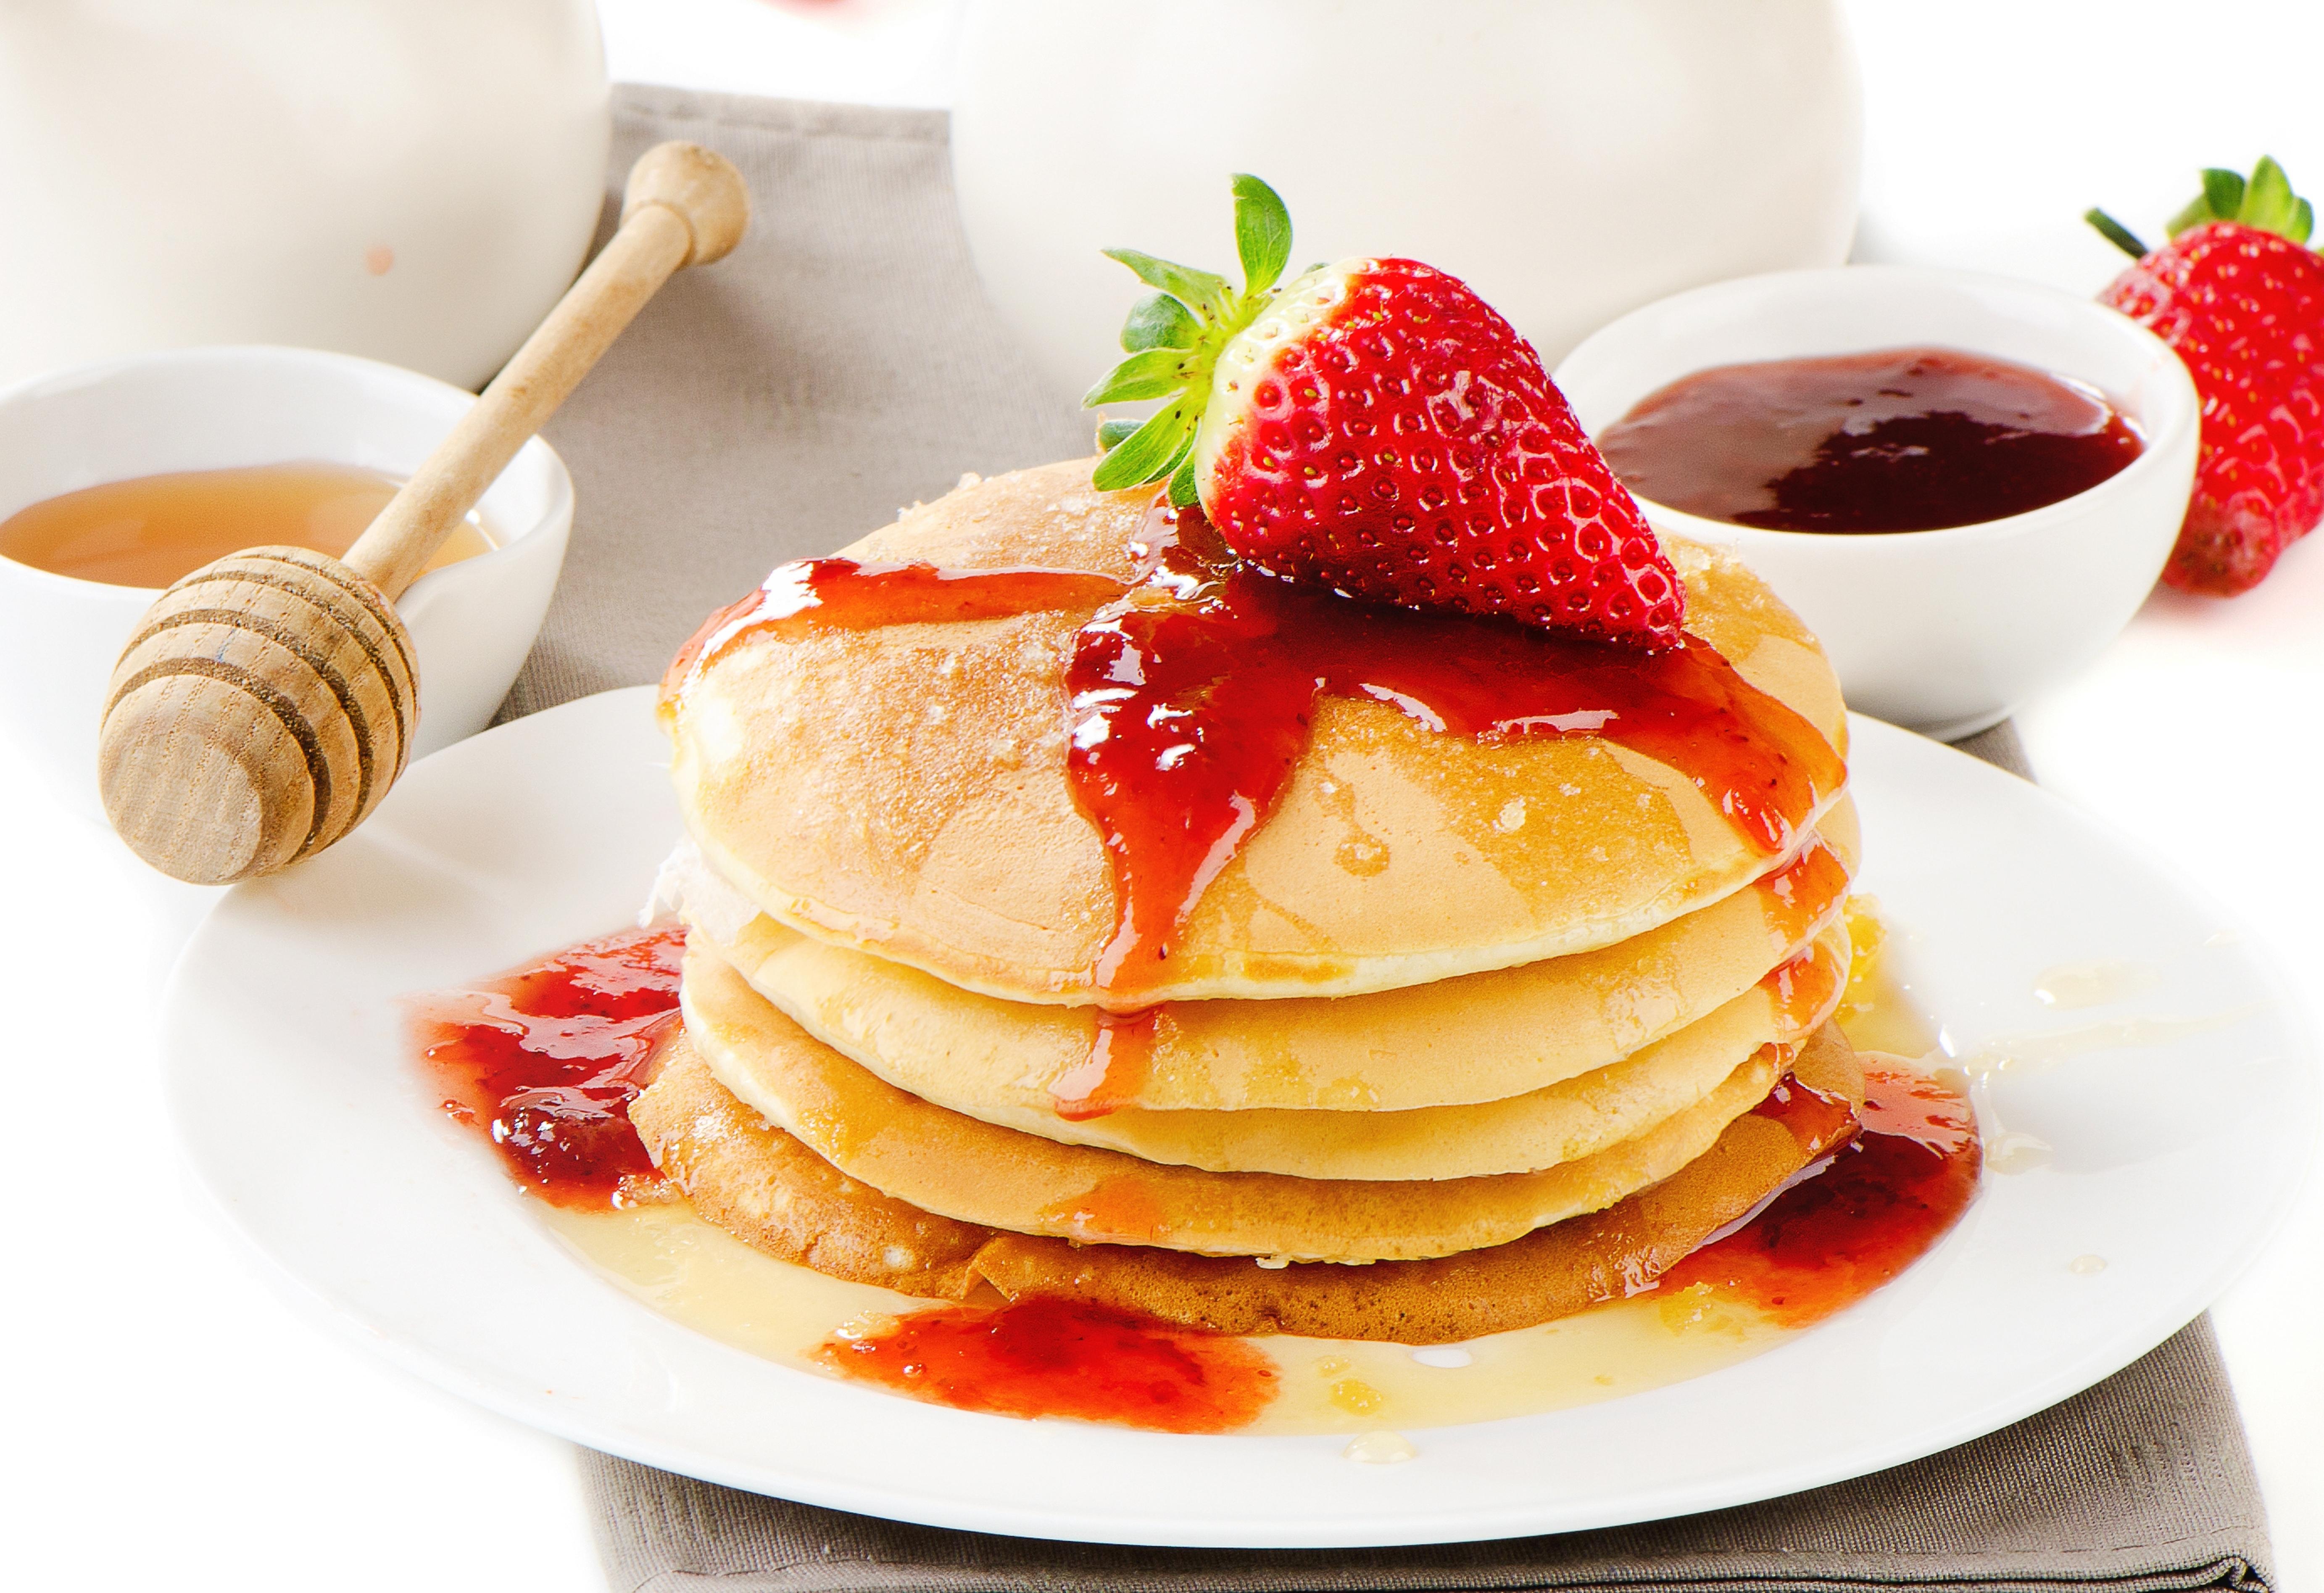 Pancakes Wallpapers 1080p AY7M2H2 WallpapersExpertcom 5530x3790